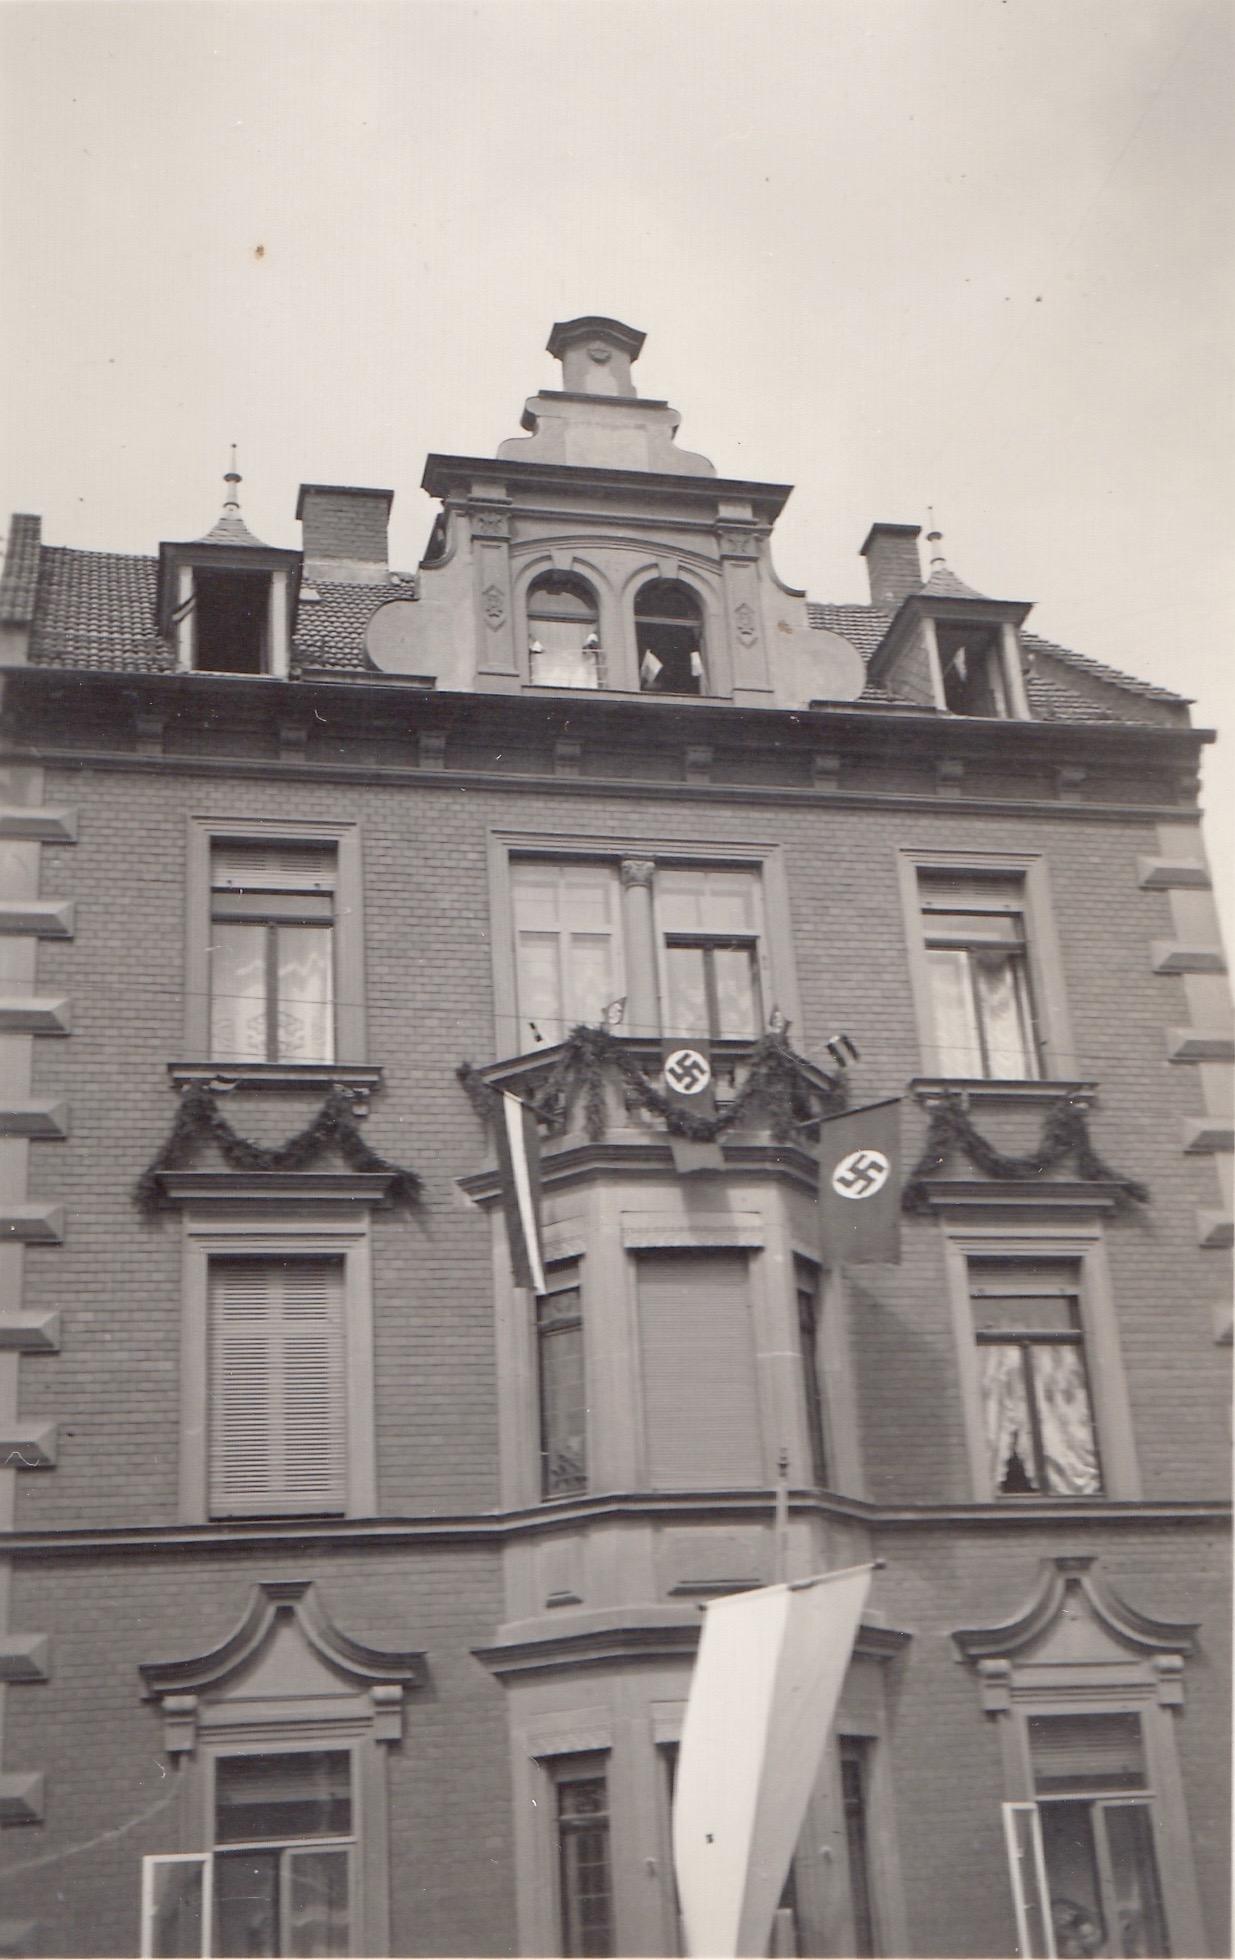 1933 - Spitalstraße 30